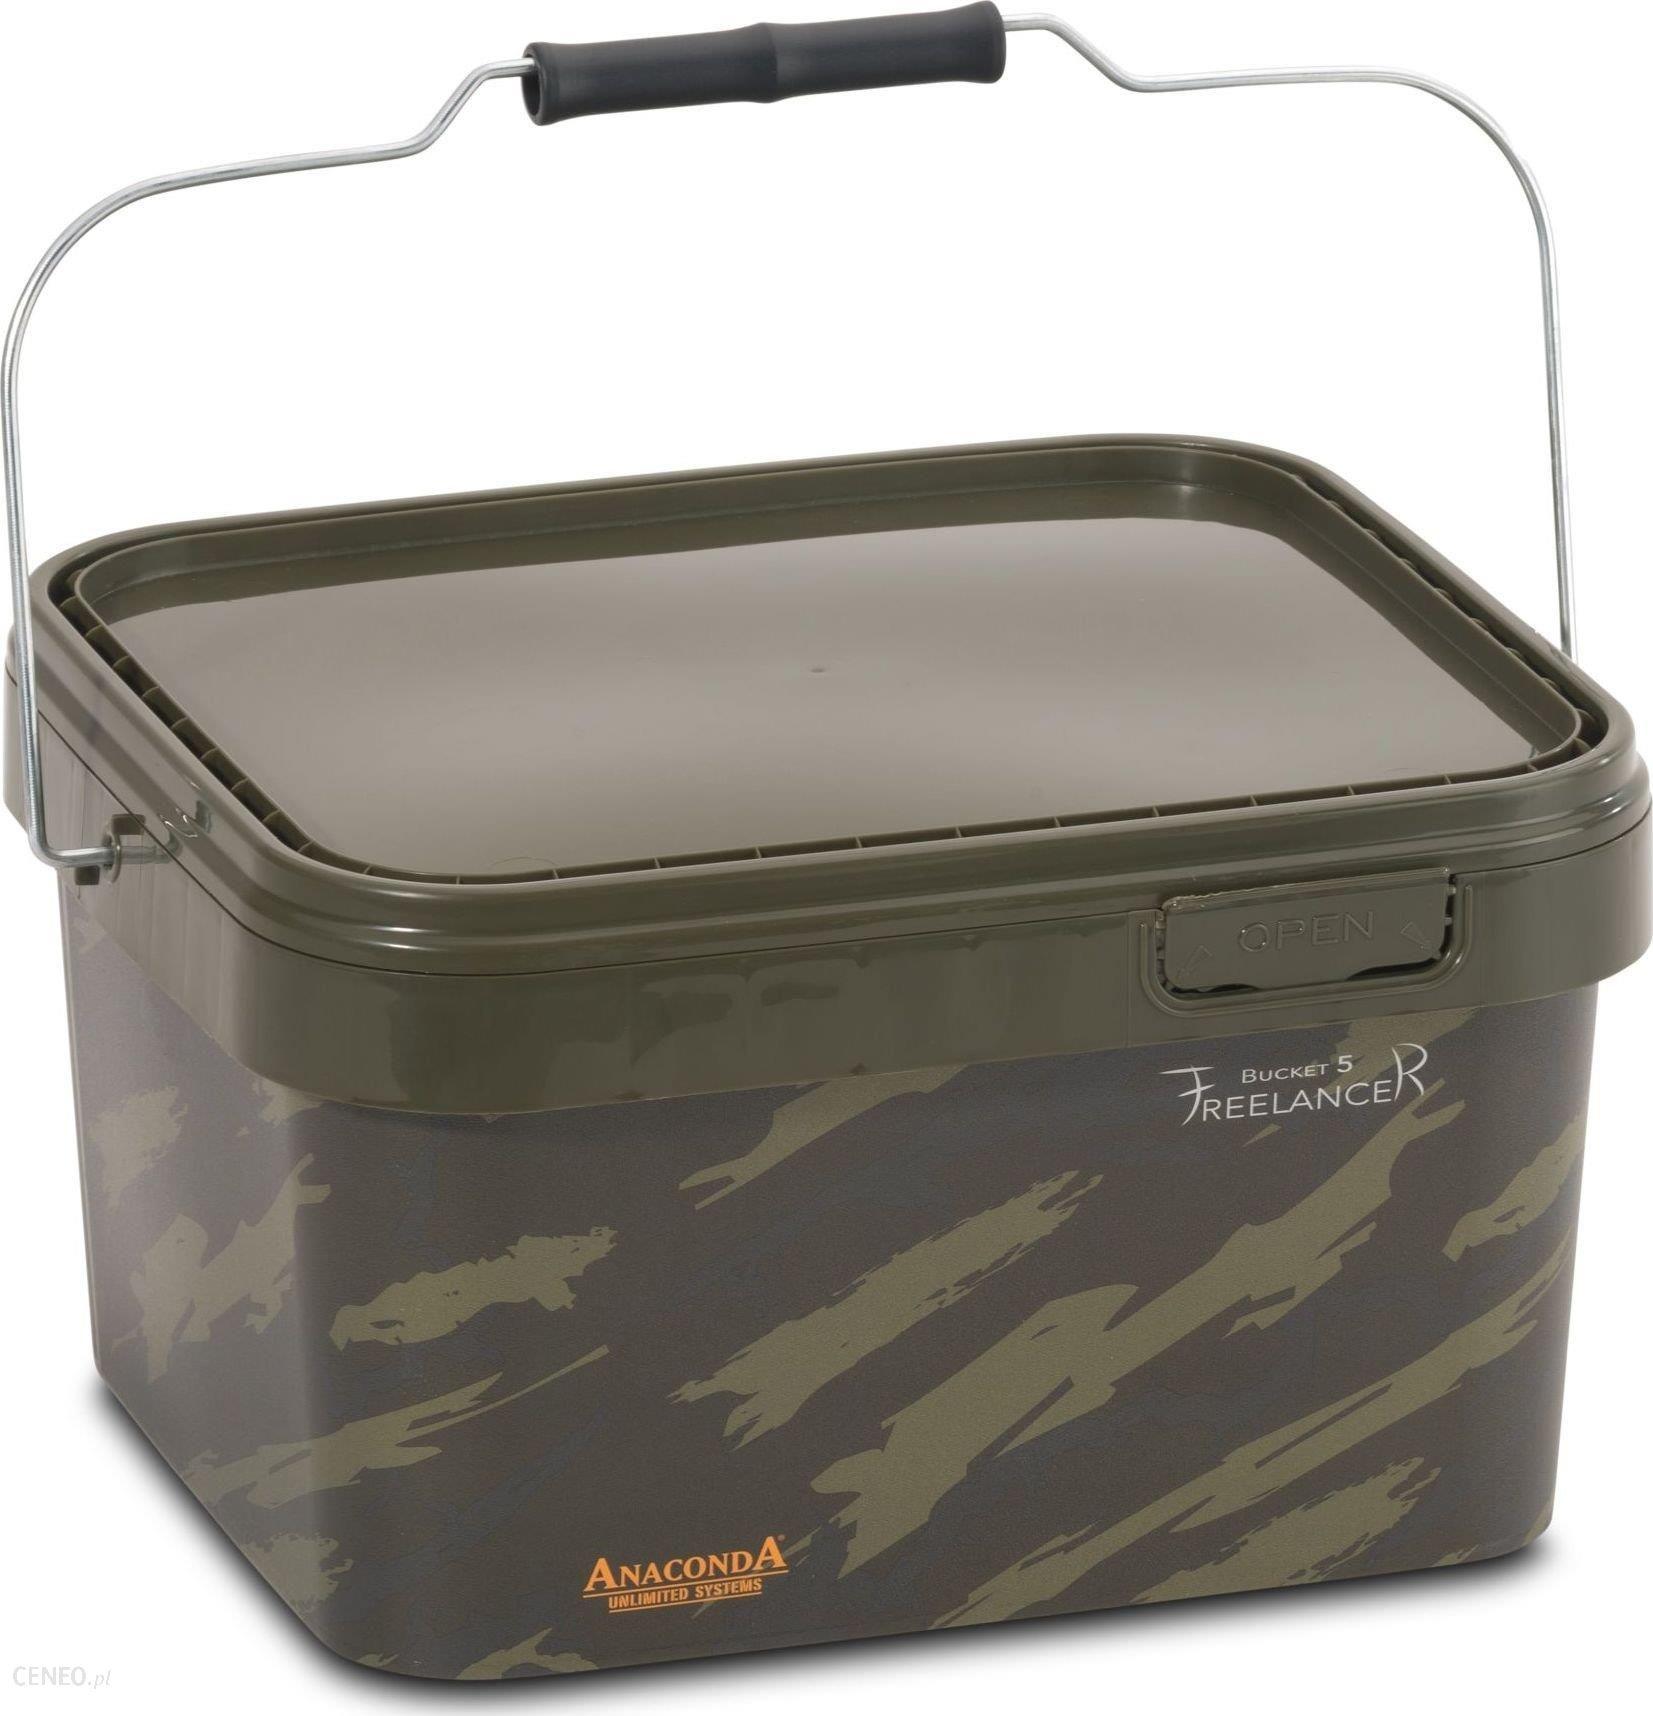 Anaconda Wiadro Freelancer Bucket 10L (2200 411)